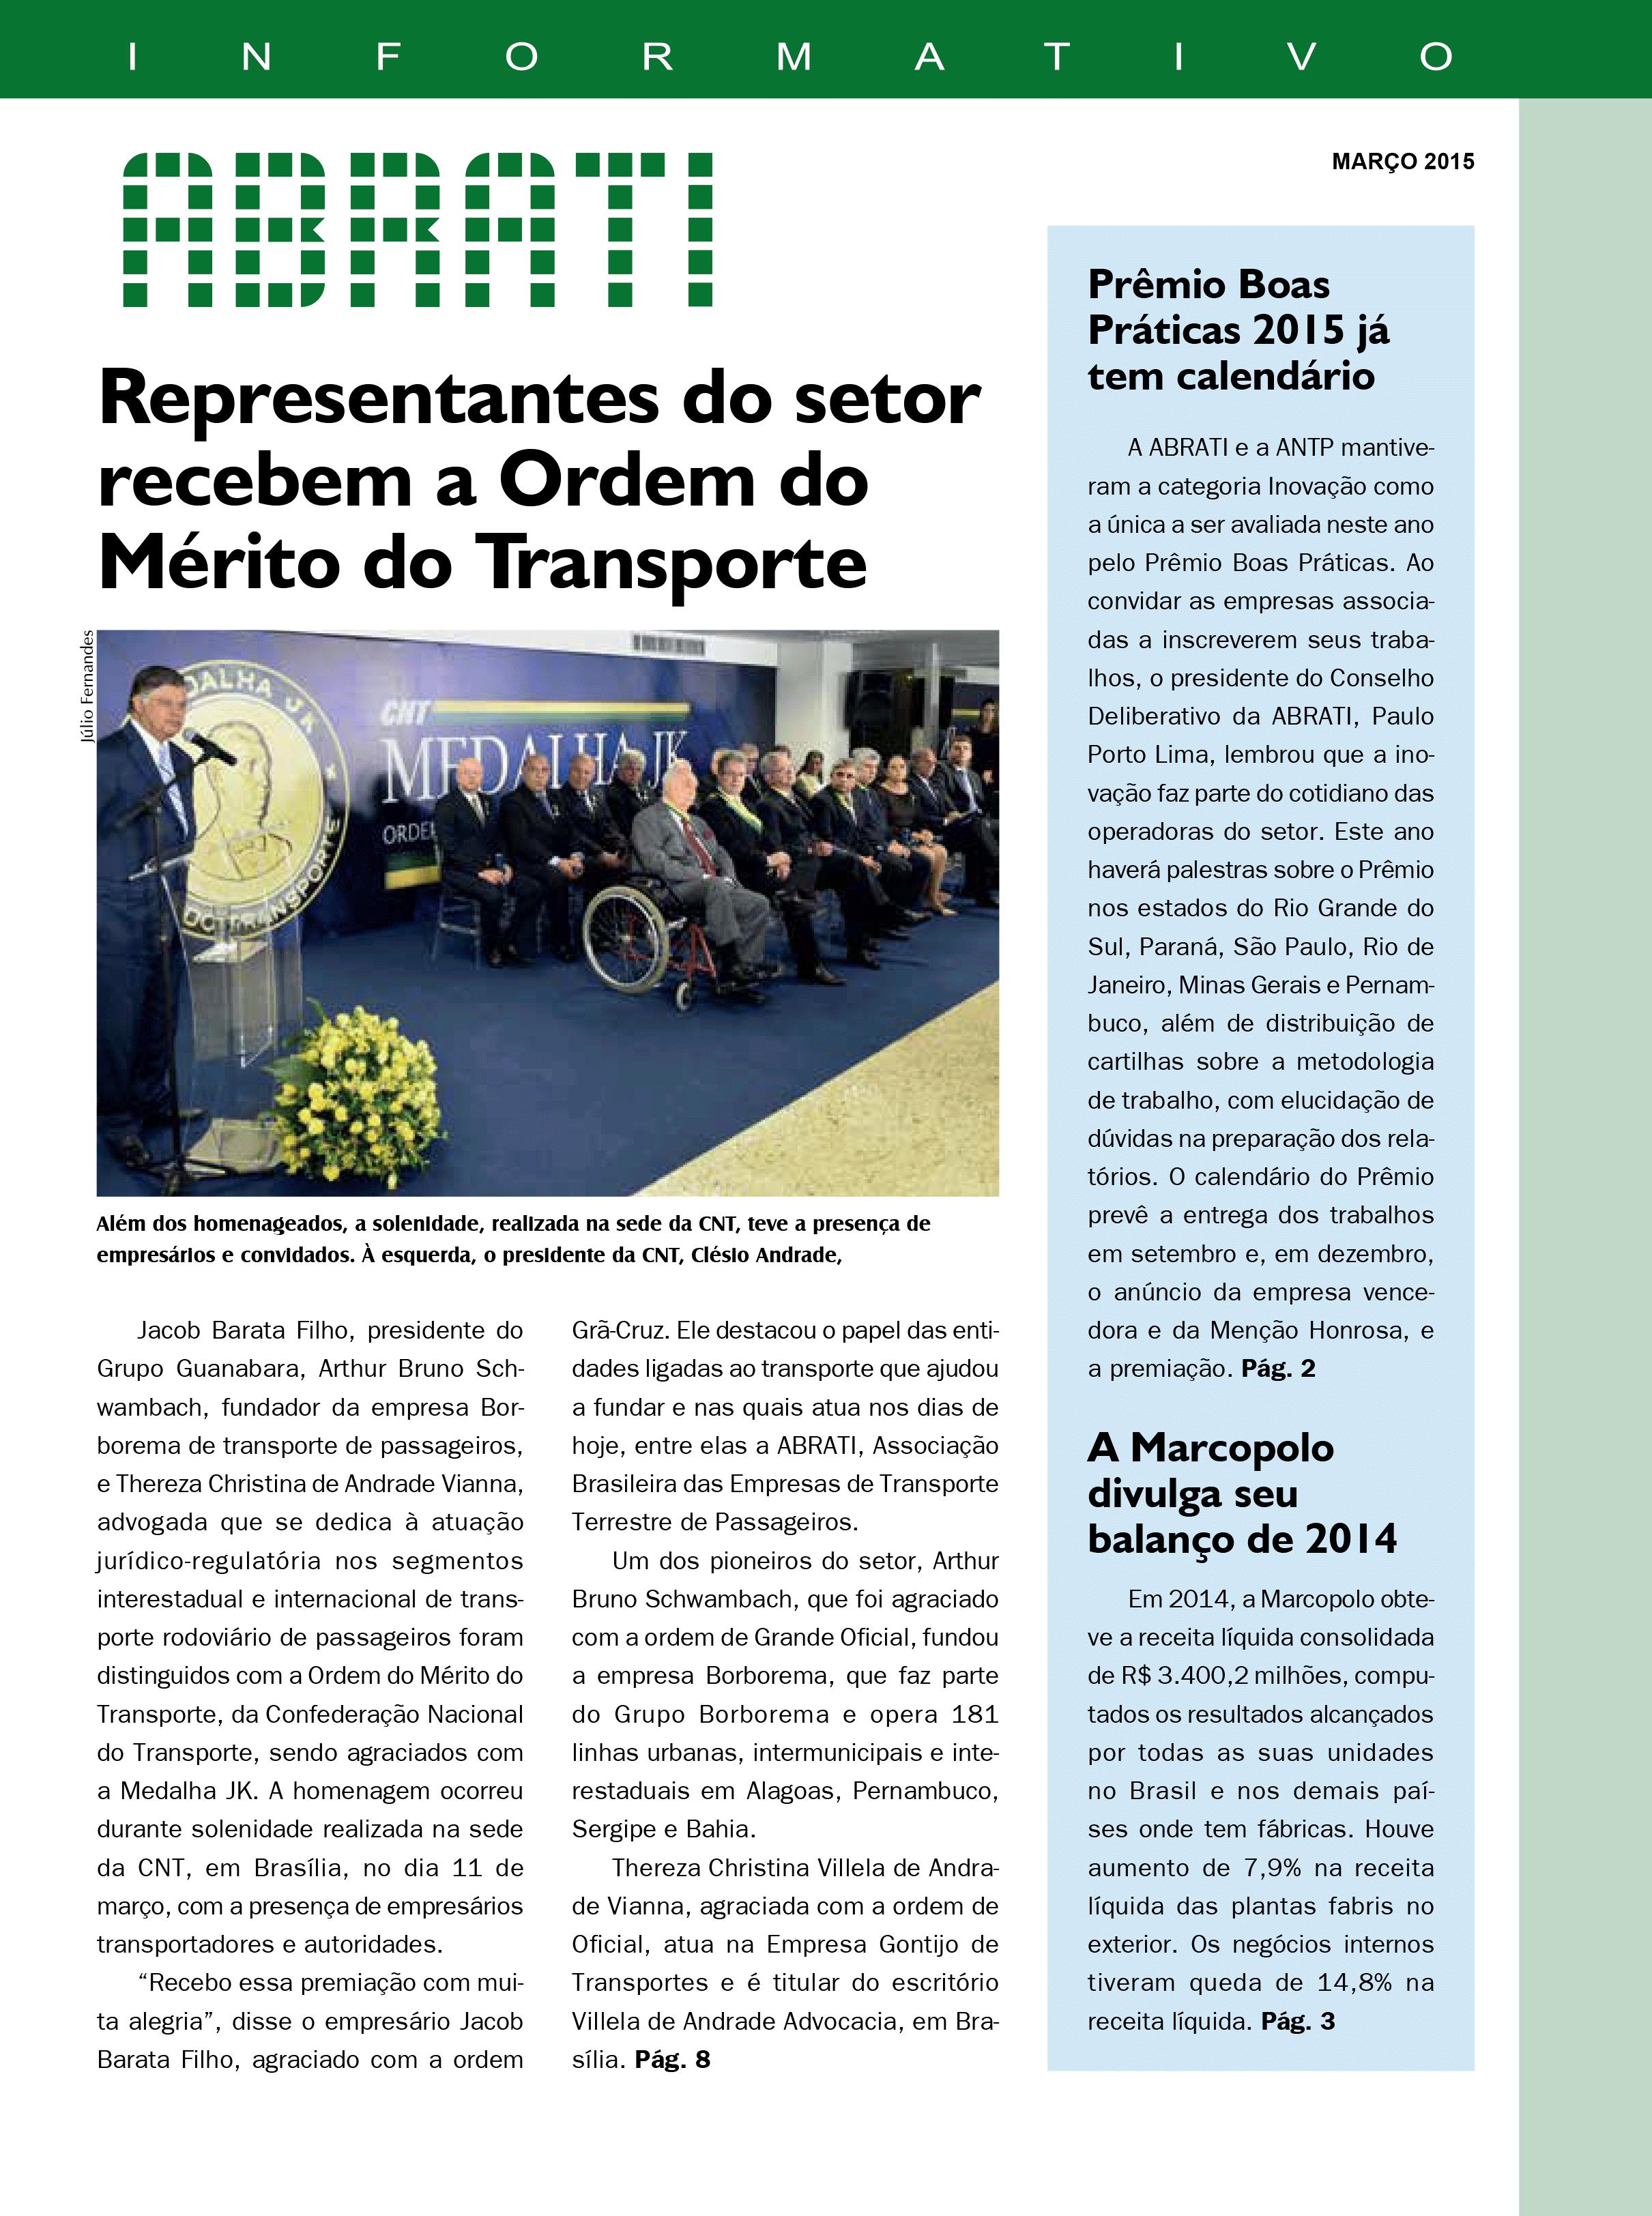 Informativo Março 2015